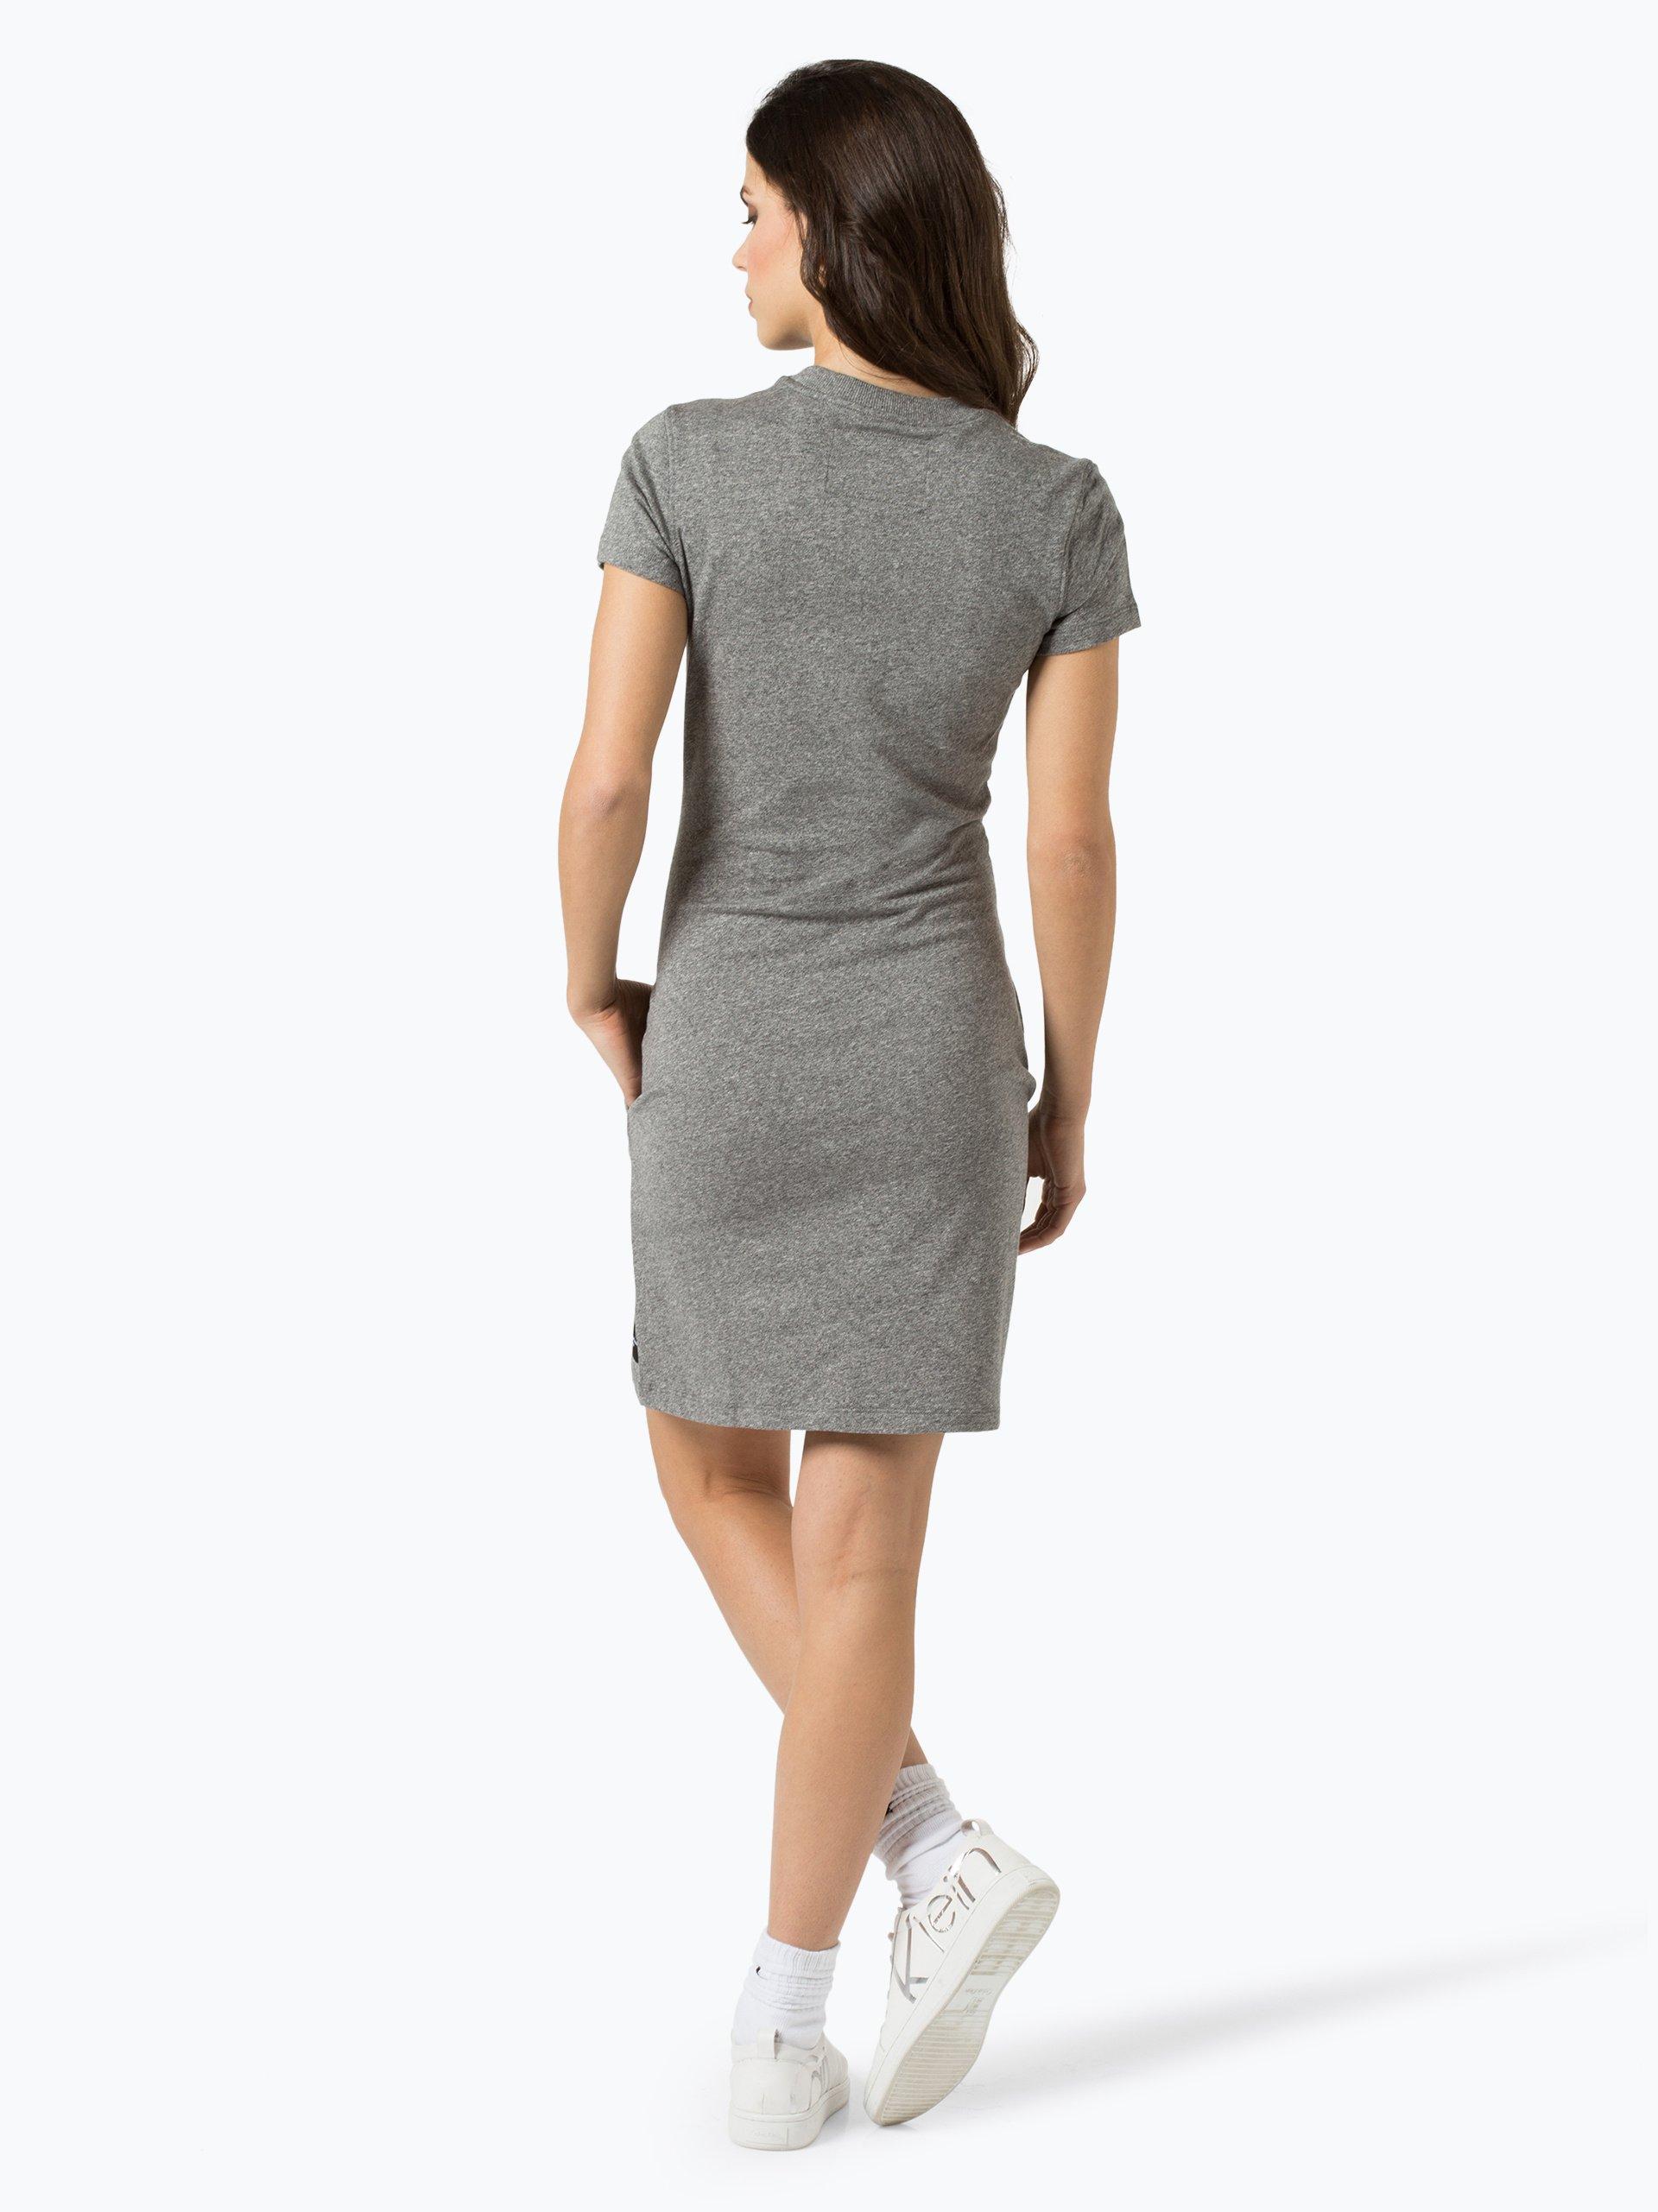 calvin klein jeans damen kleid grau uni online kaufen. Black Bedroom Furniture Sets. Home Design Ideas